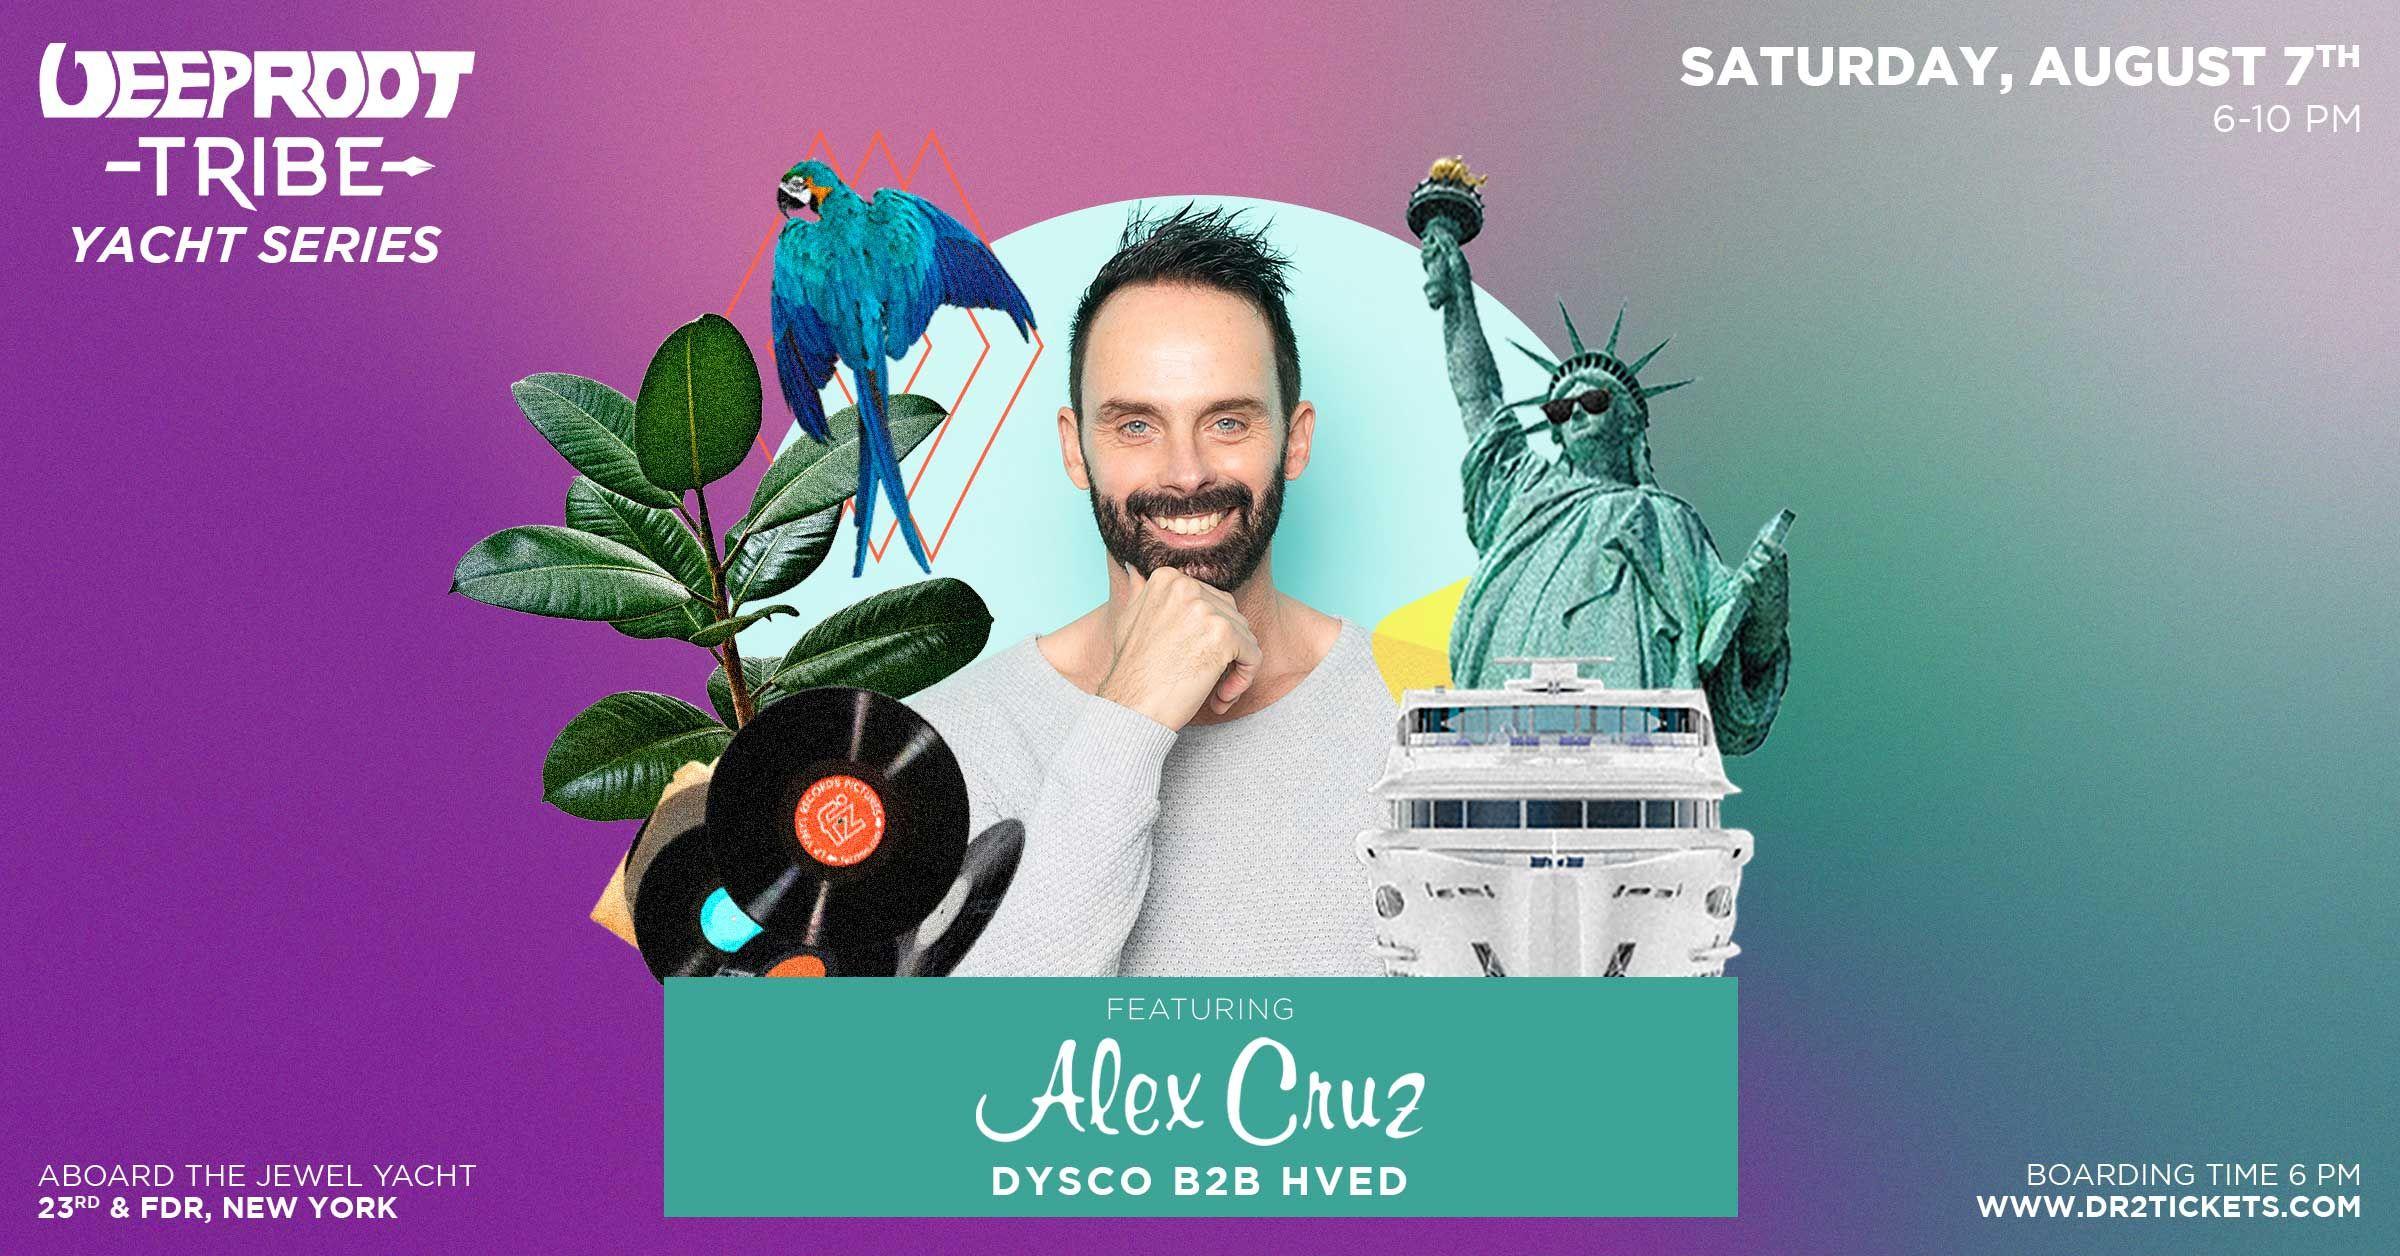 Deep Root Yacht Party ft. Alex Cruz   August 7th